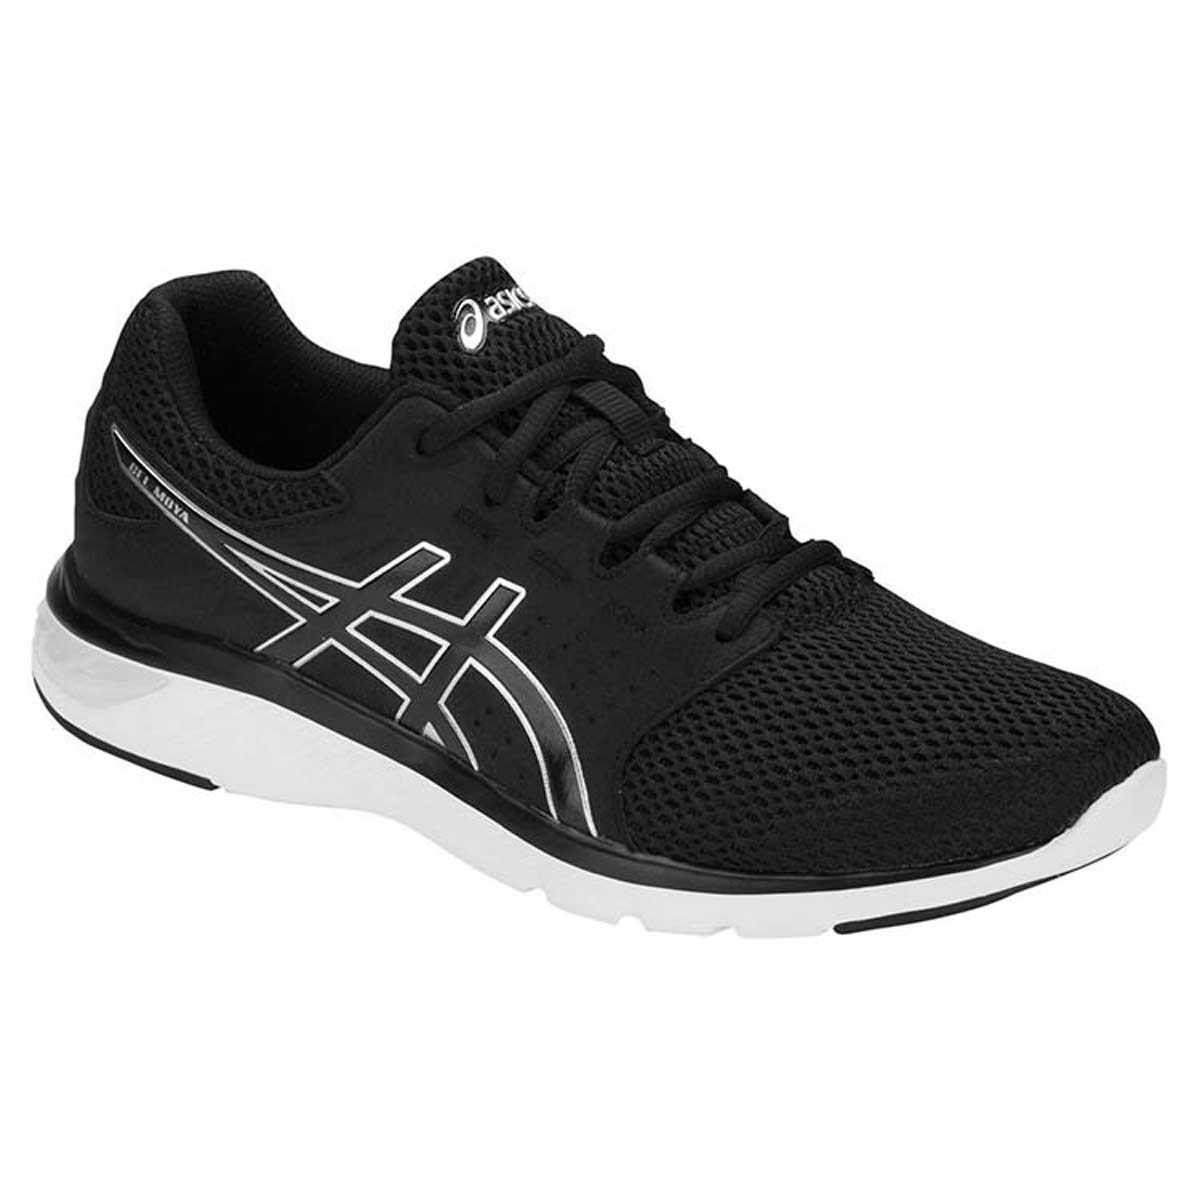 Buy Asics Gel-Moya Running Shoes (Black/Silver) Online India